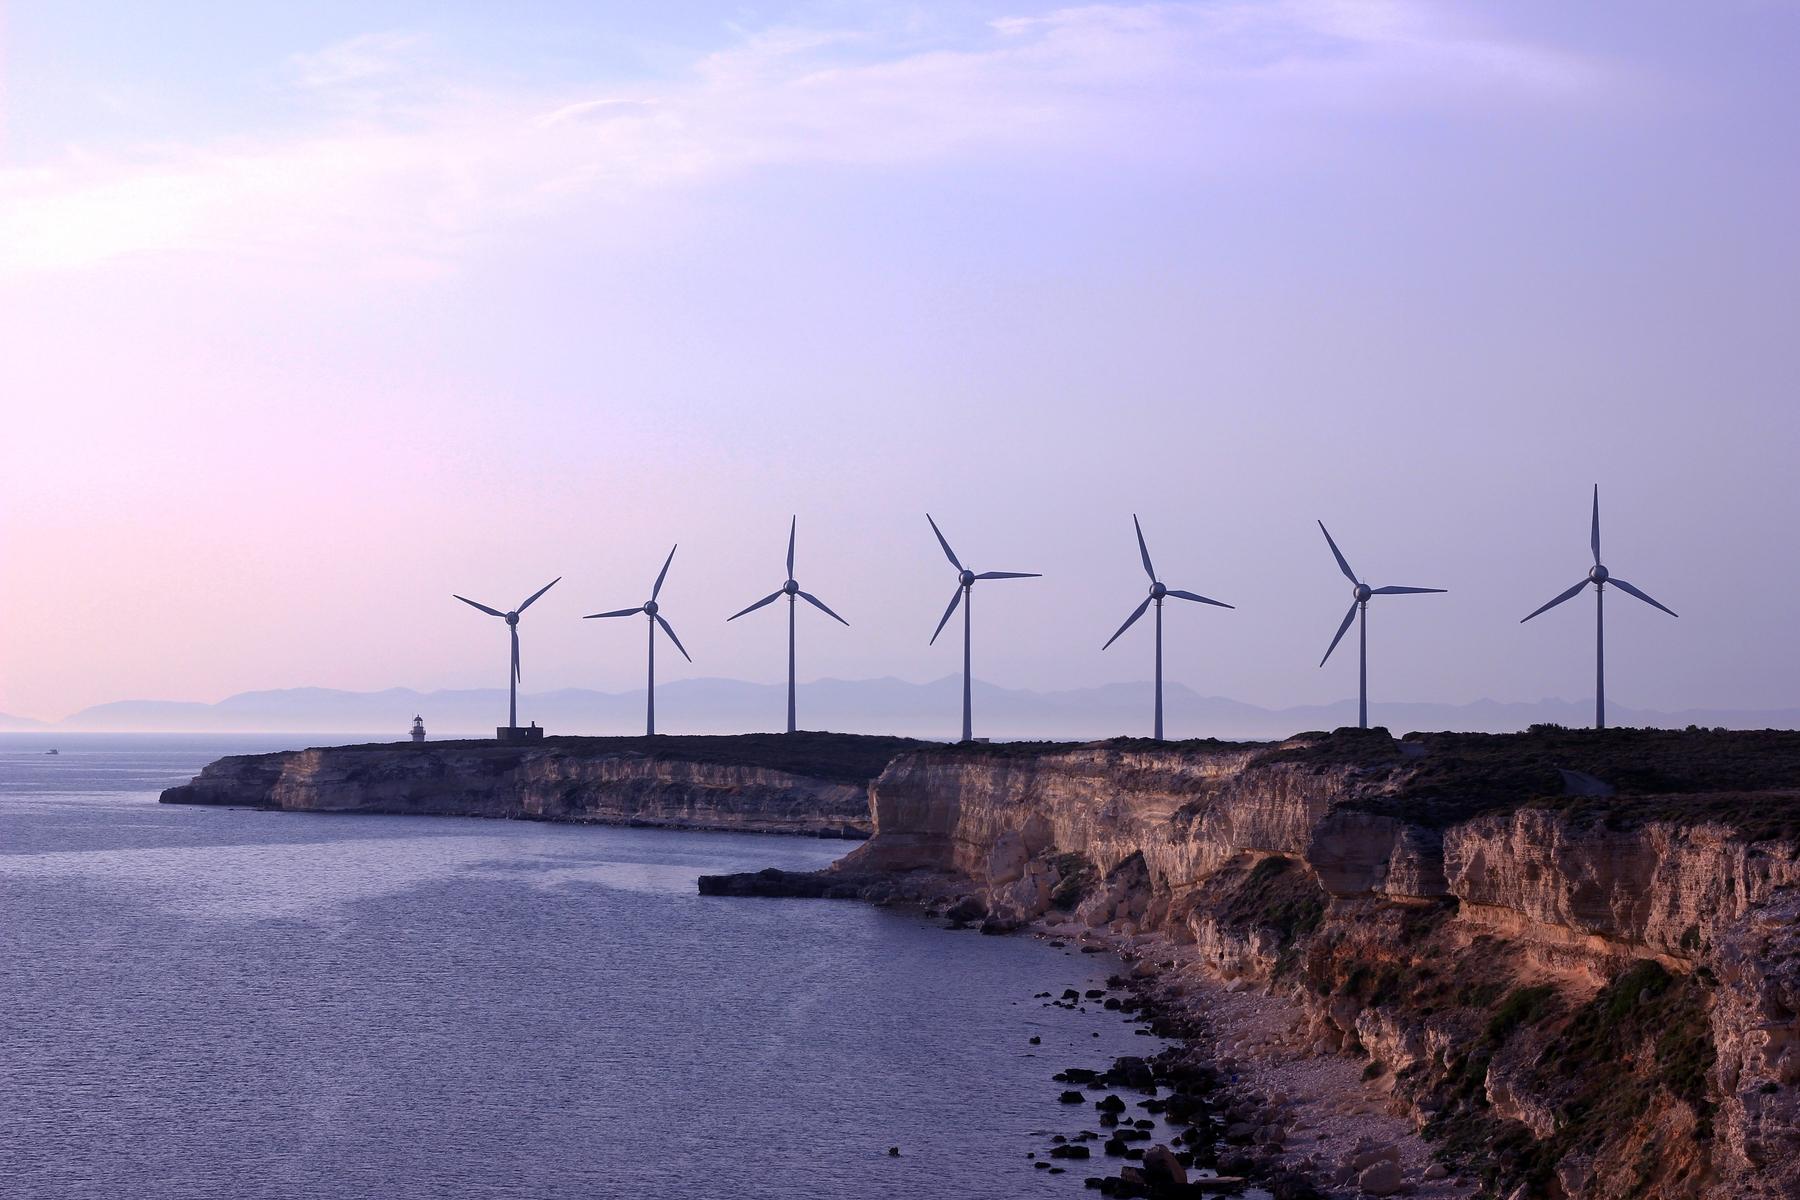 Sustainable destinations using renewable energy sources like wind turbines